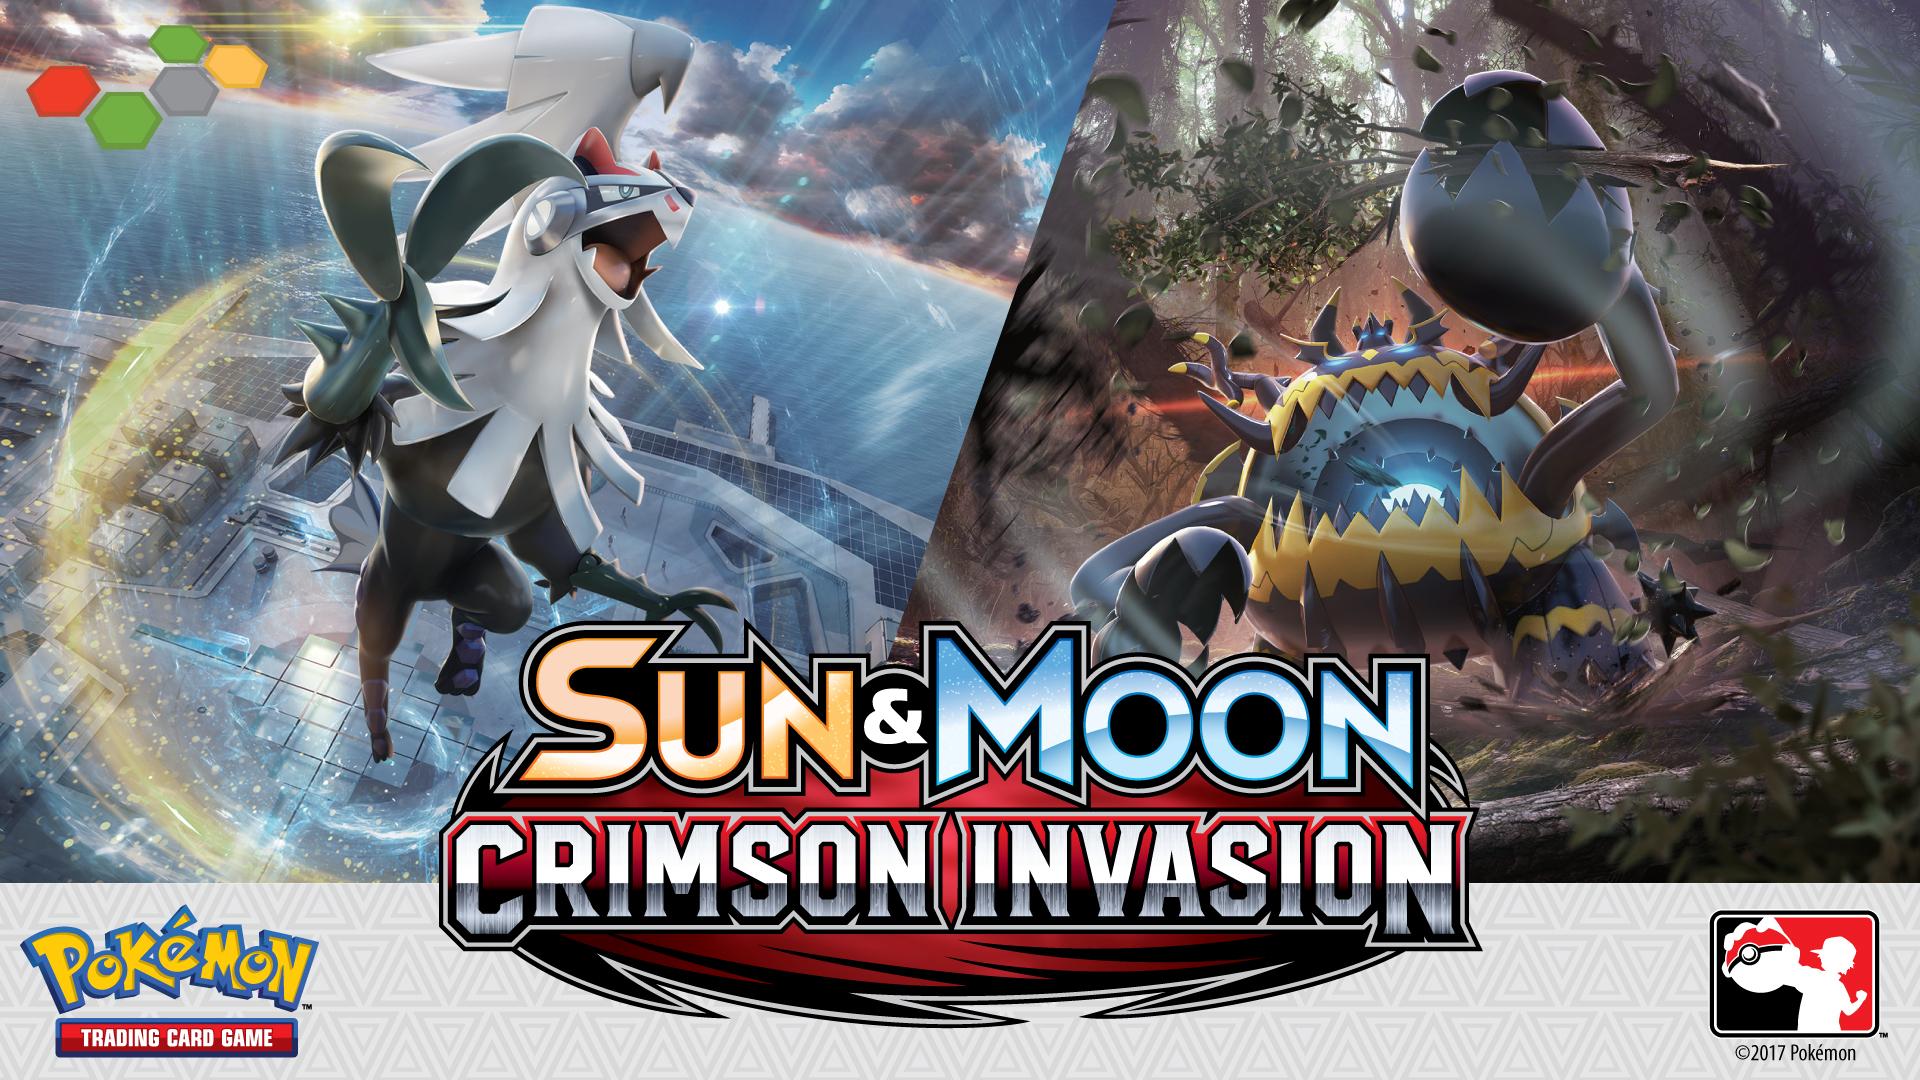 pokemon crimson invasion event image.png